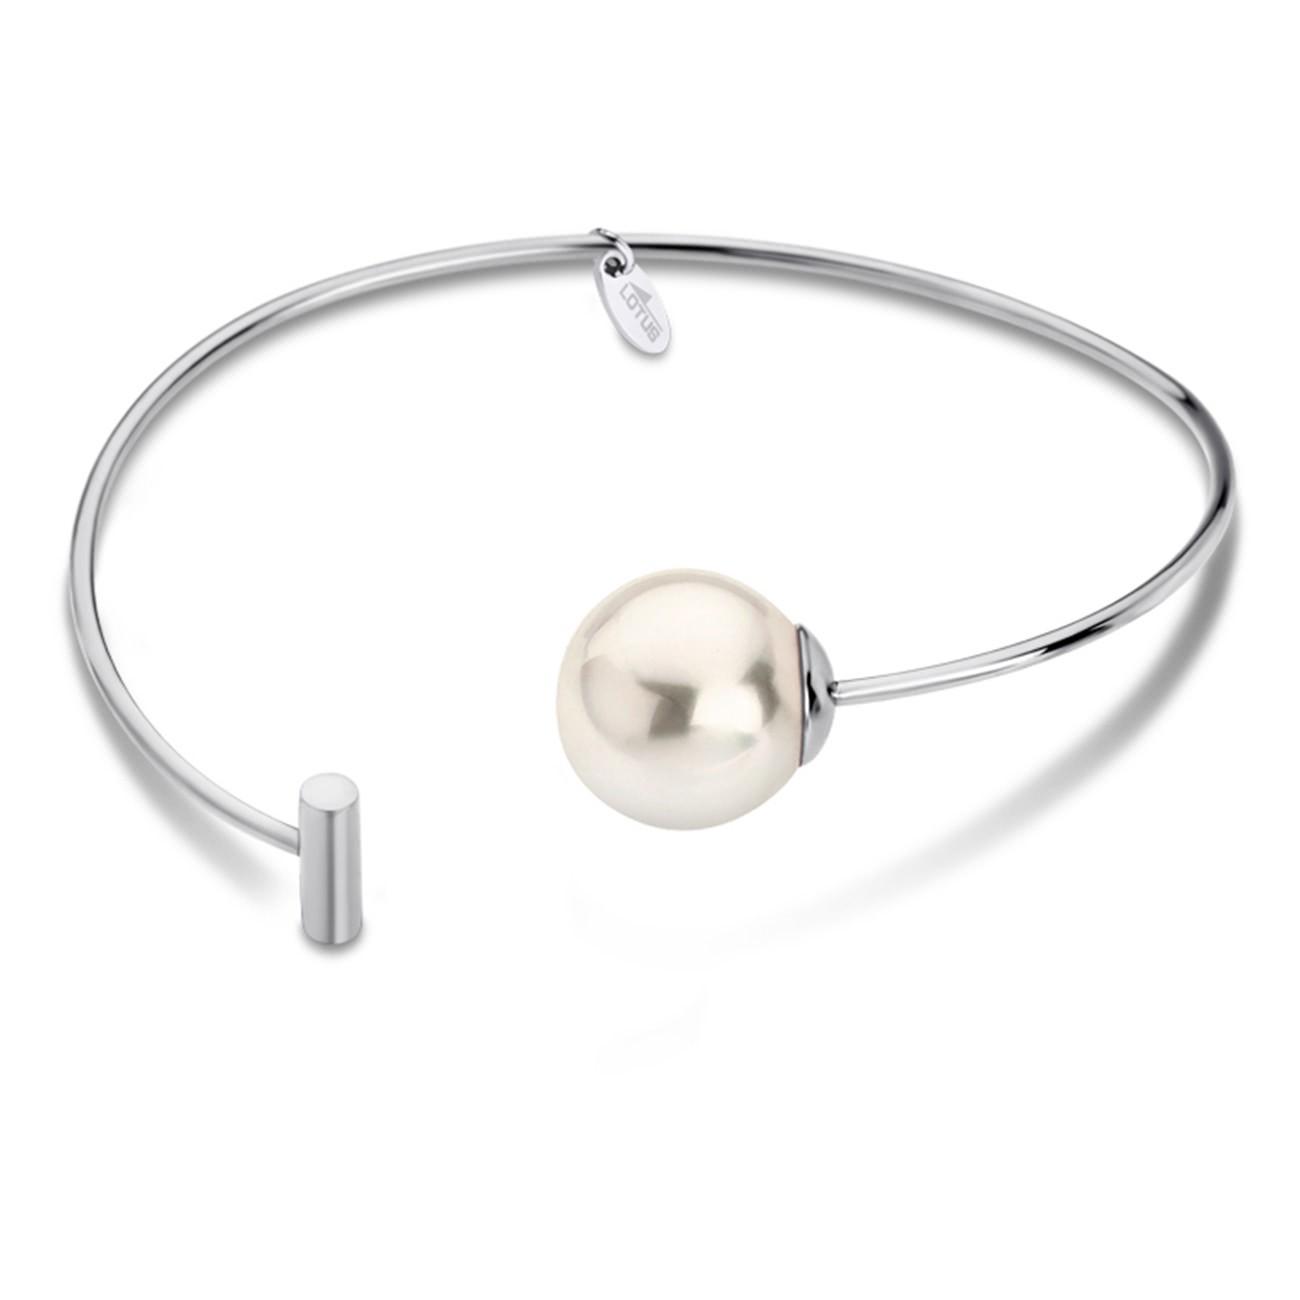 LOTUS Style Armband Damen Armreif Perle LS1822-2/1 Edelstahl JLS1822-2-1